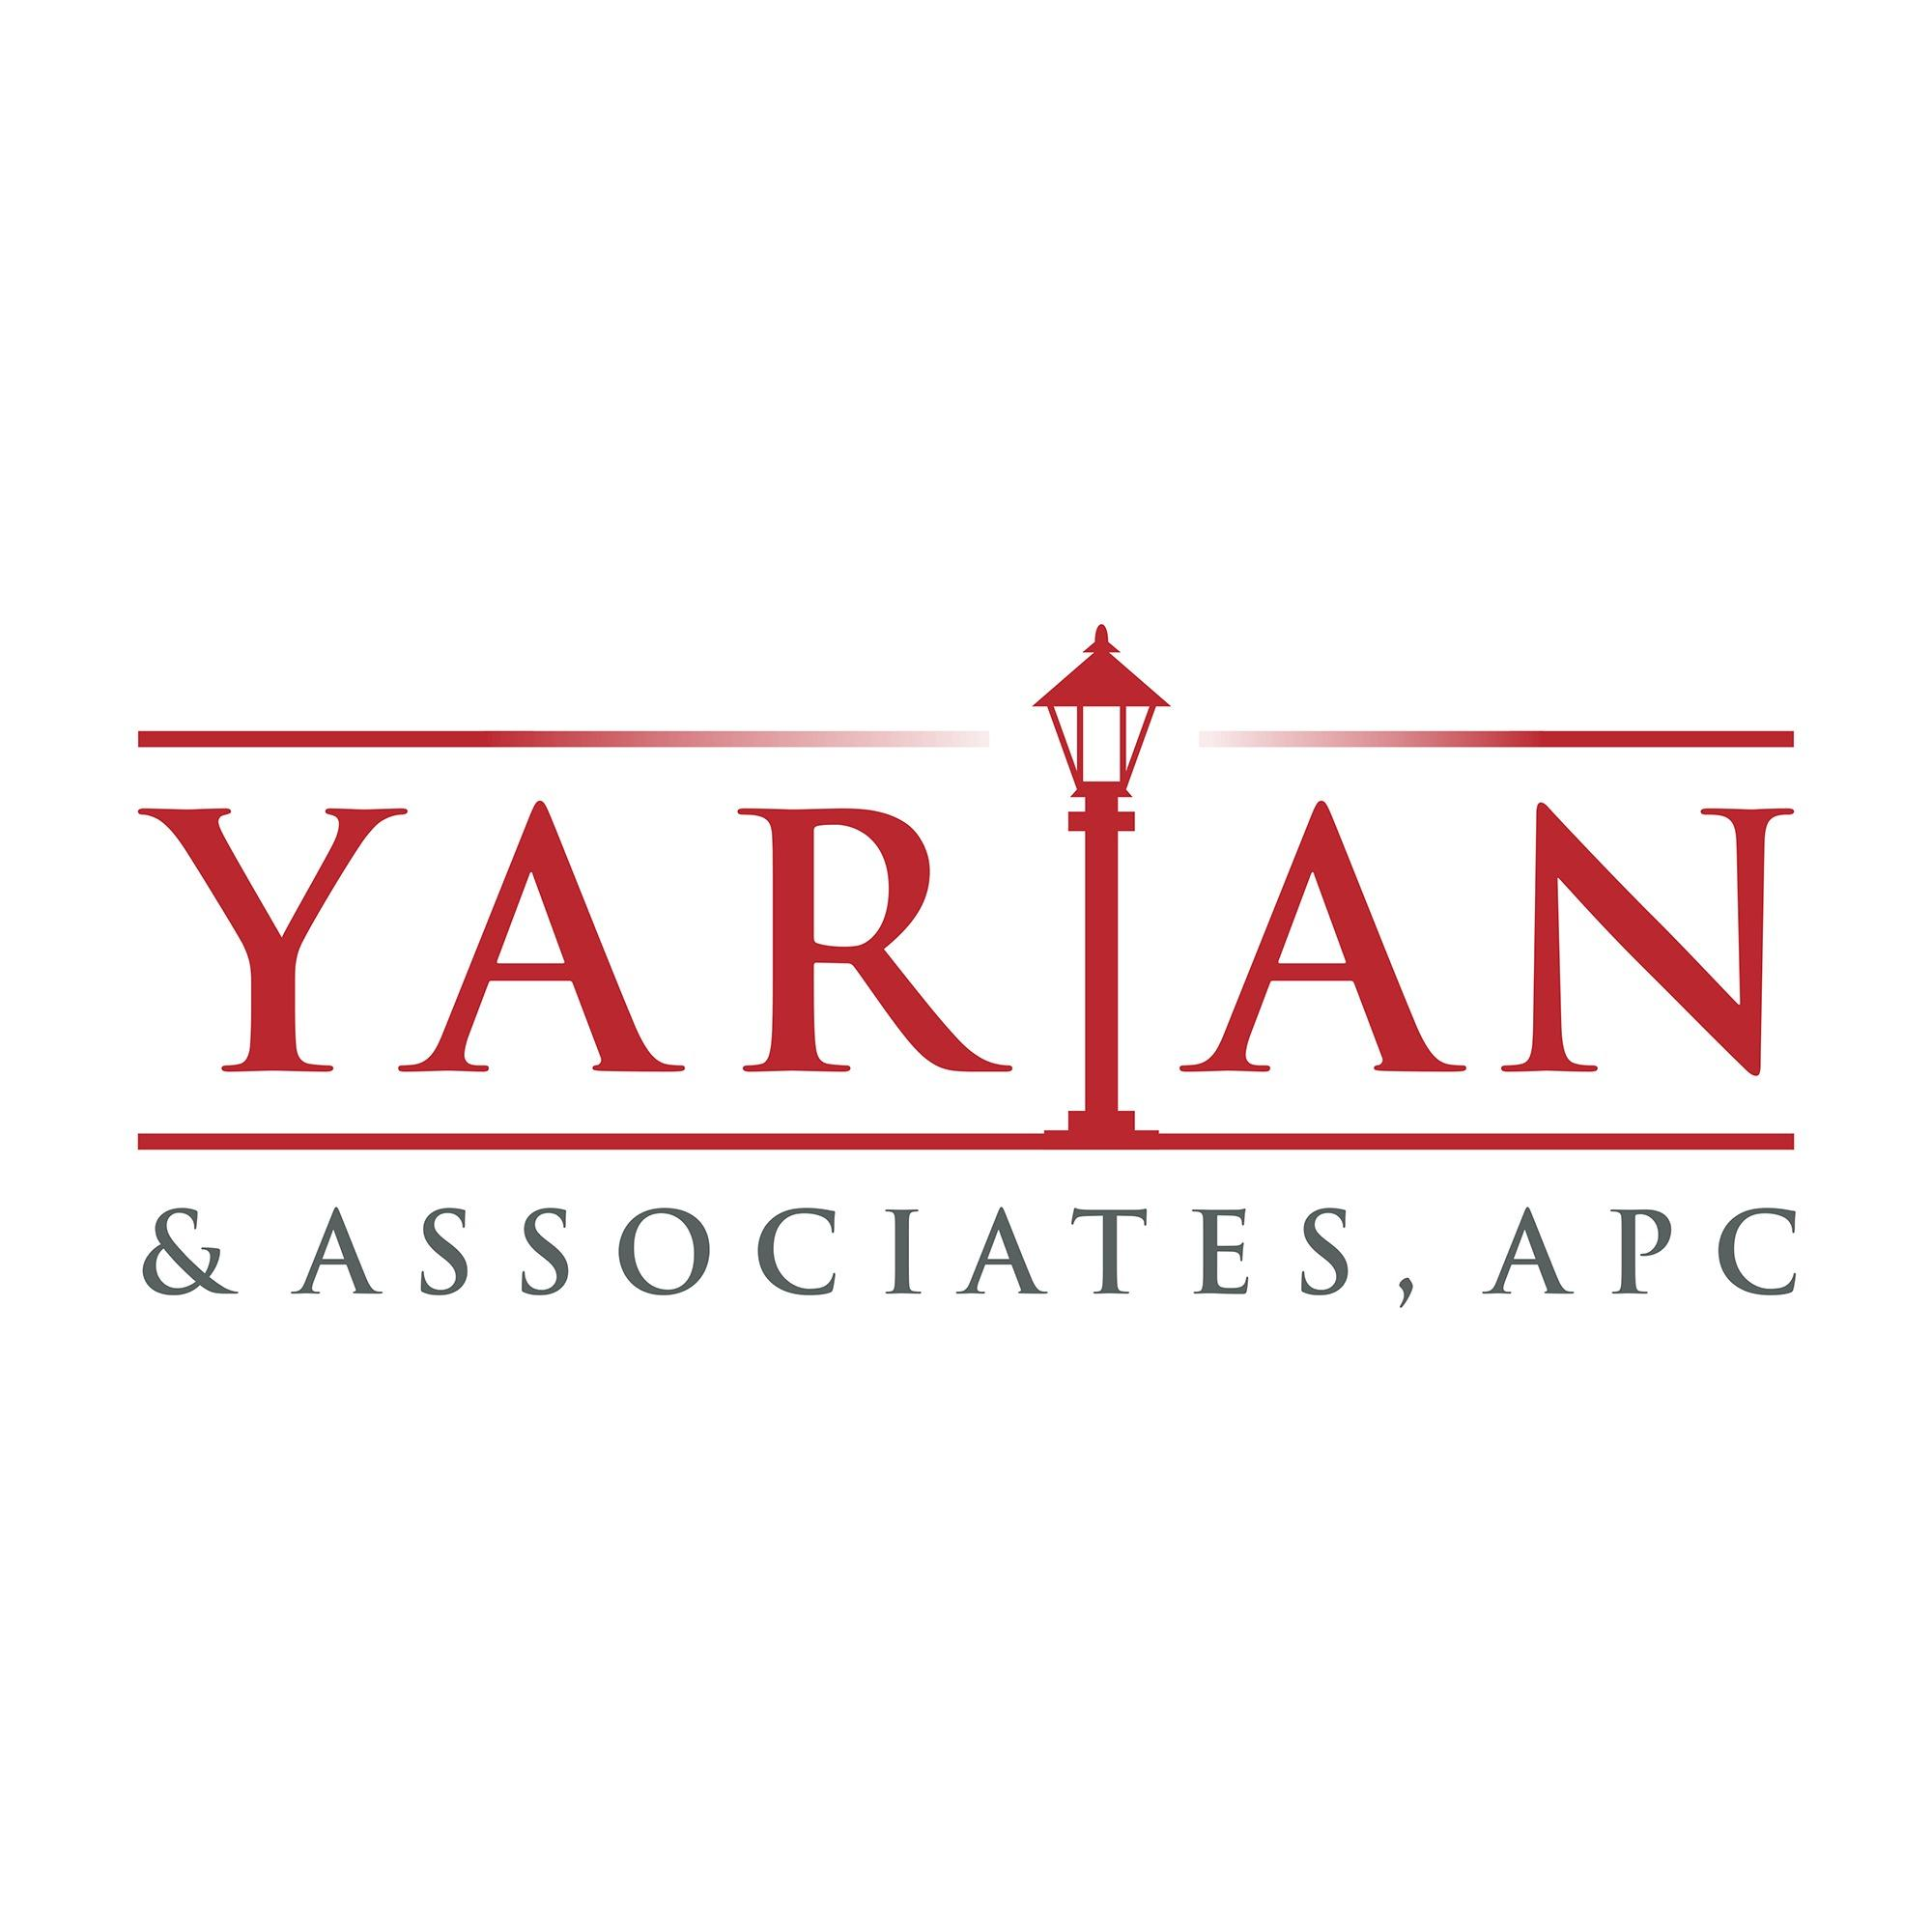 Visalia Personal Injury Attorneys in Tulare County, California